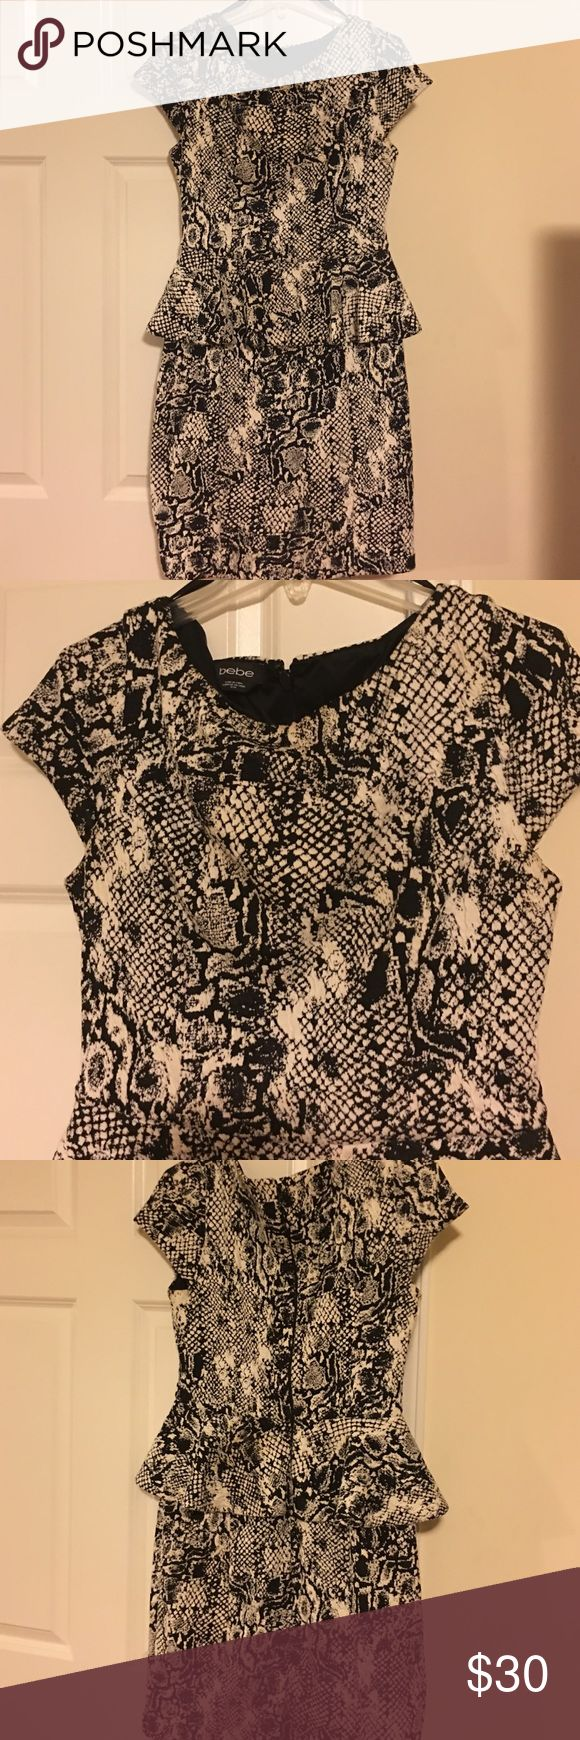 Bebe Dress Python Print Peplin Dress Python Peplin Dress bebe Dresses